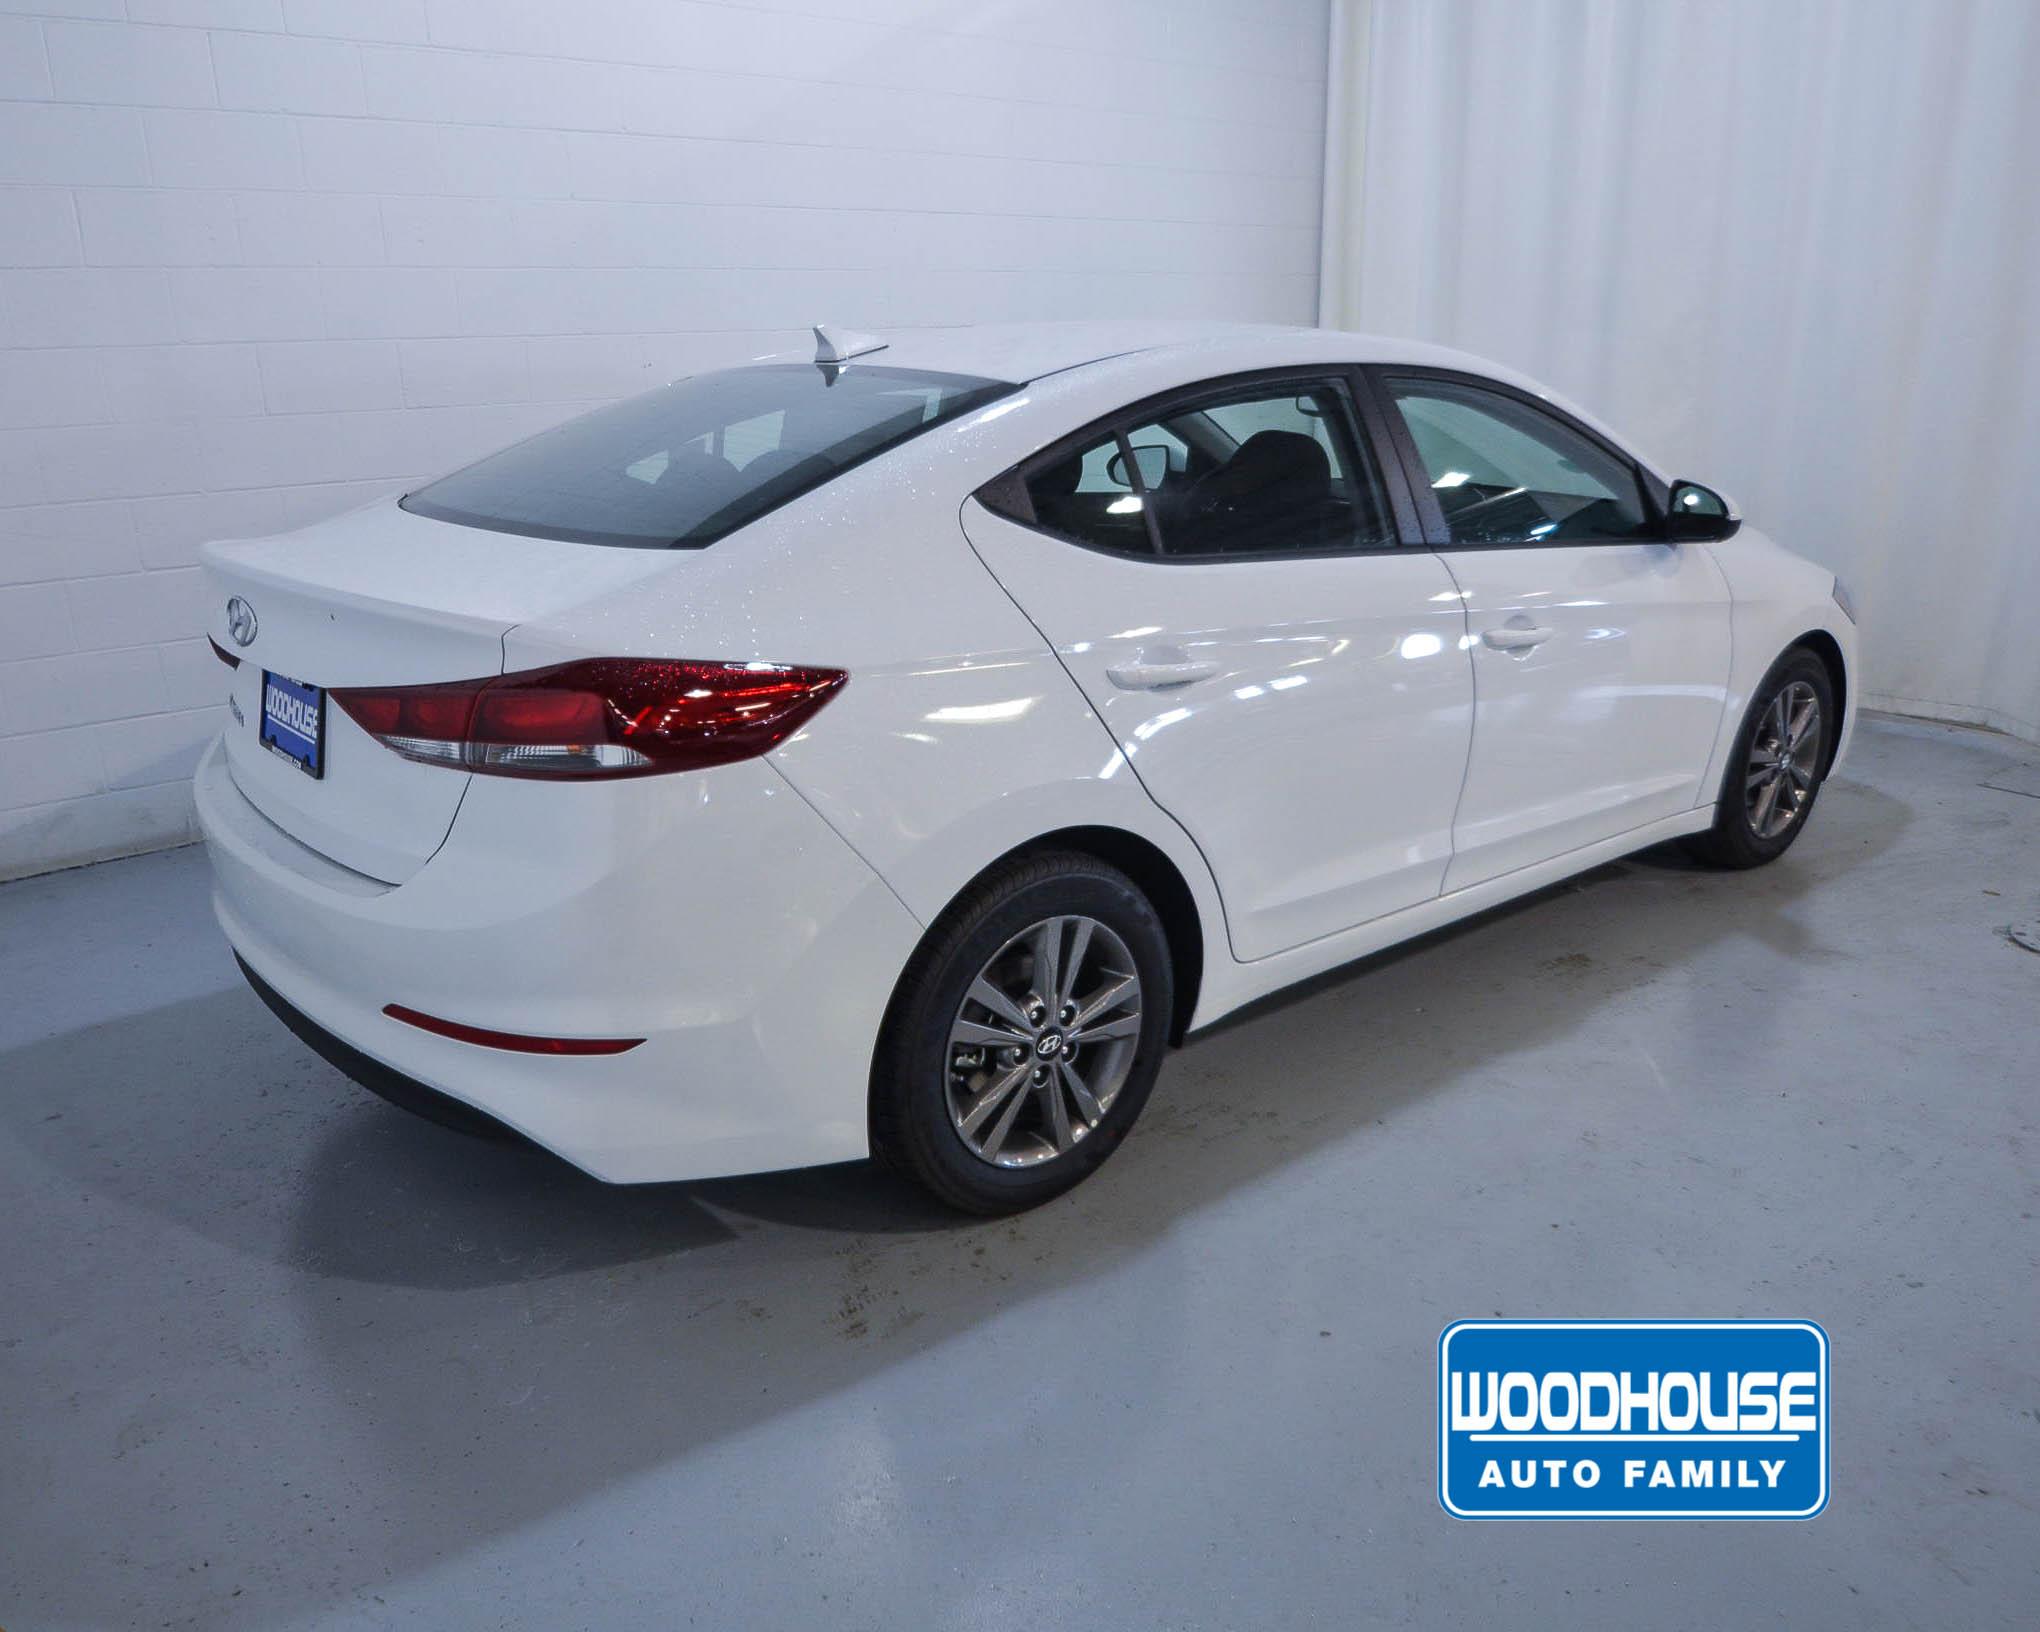 Hyundai Elantra For Sale Woodhouse Auto